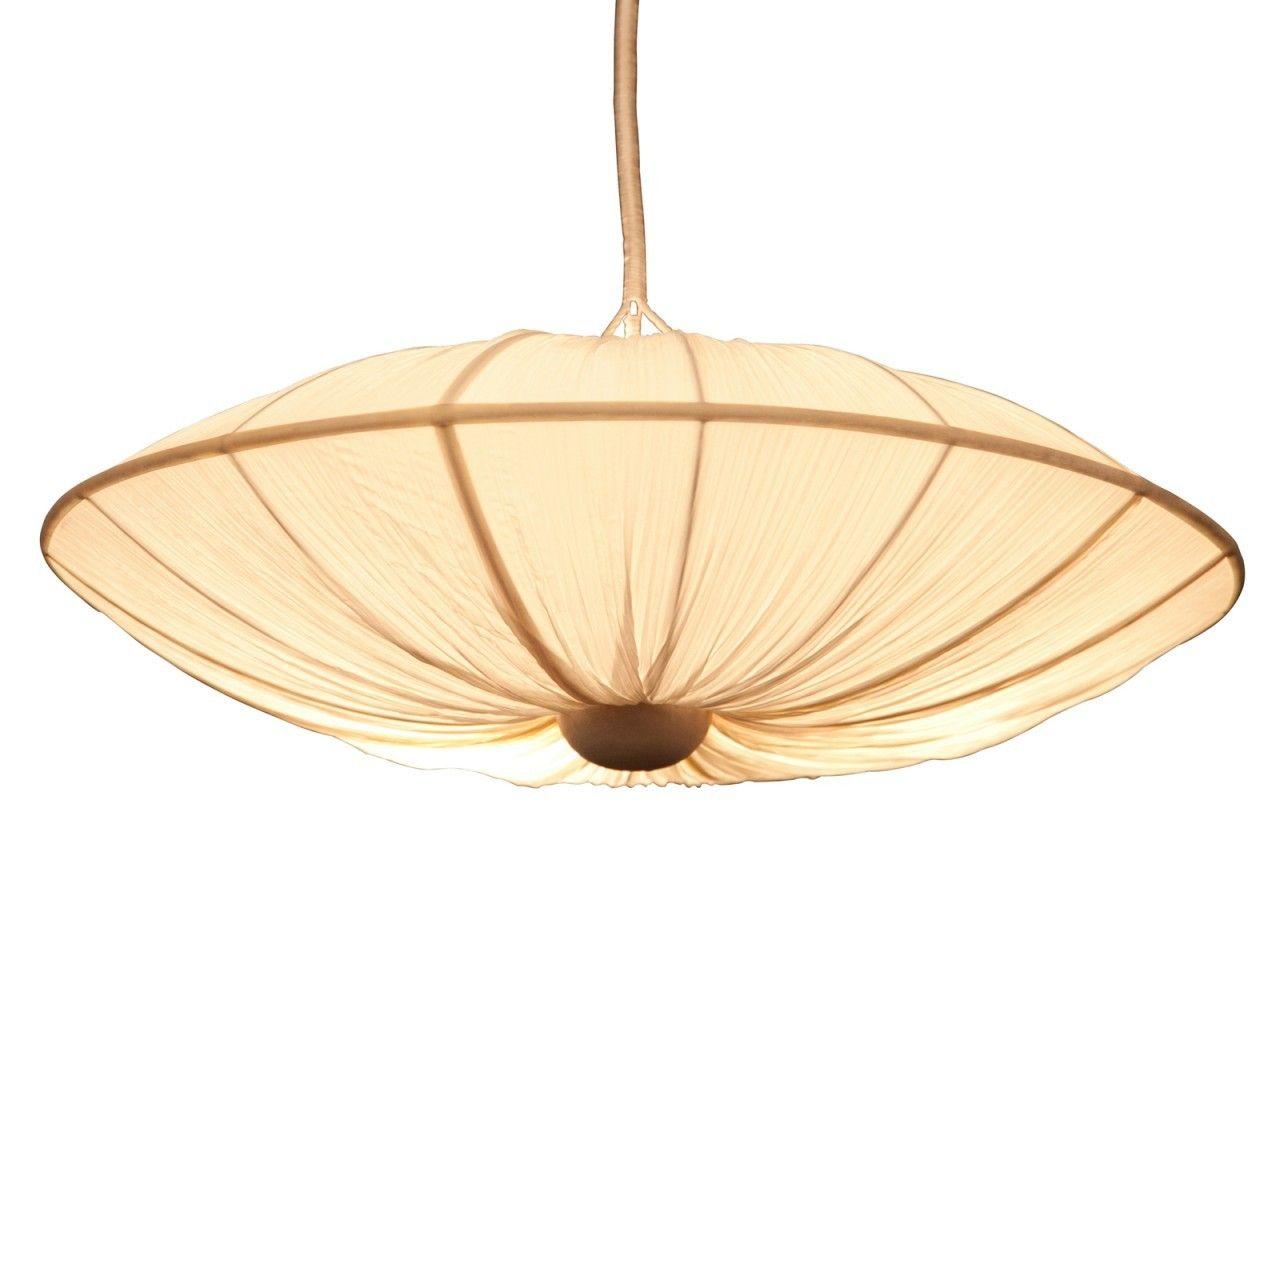 Arche ceiling lamp gong online shop lights for shepherd